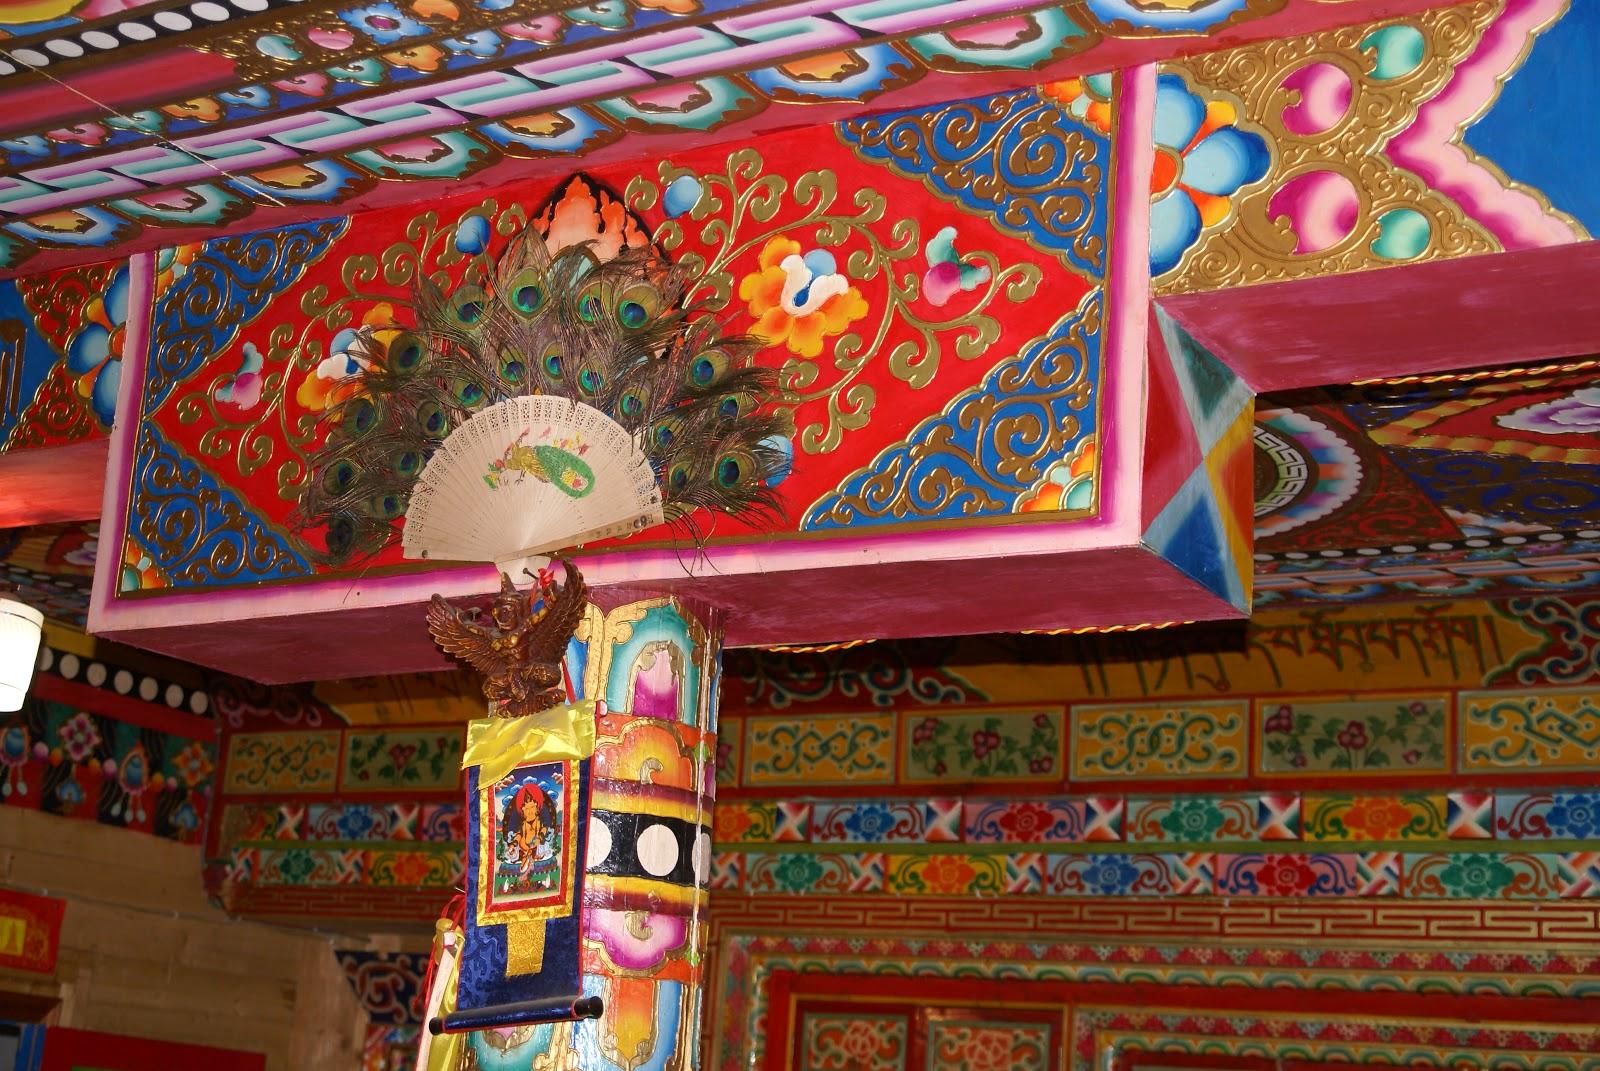 Creators Joy Tibetan Lotus Flower Motif In Polymer Clay Millefiori